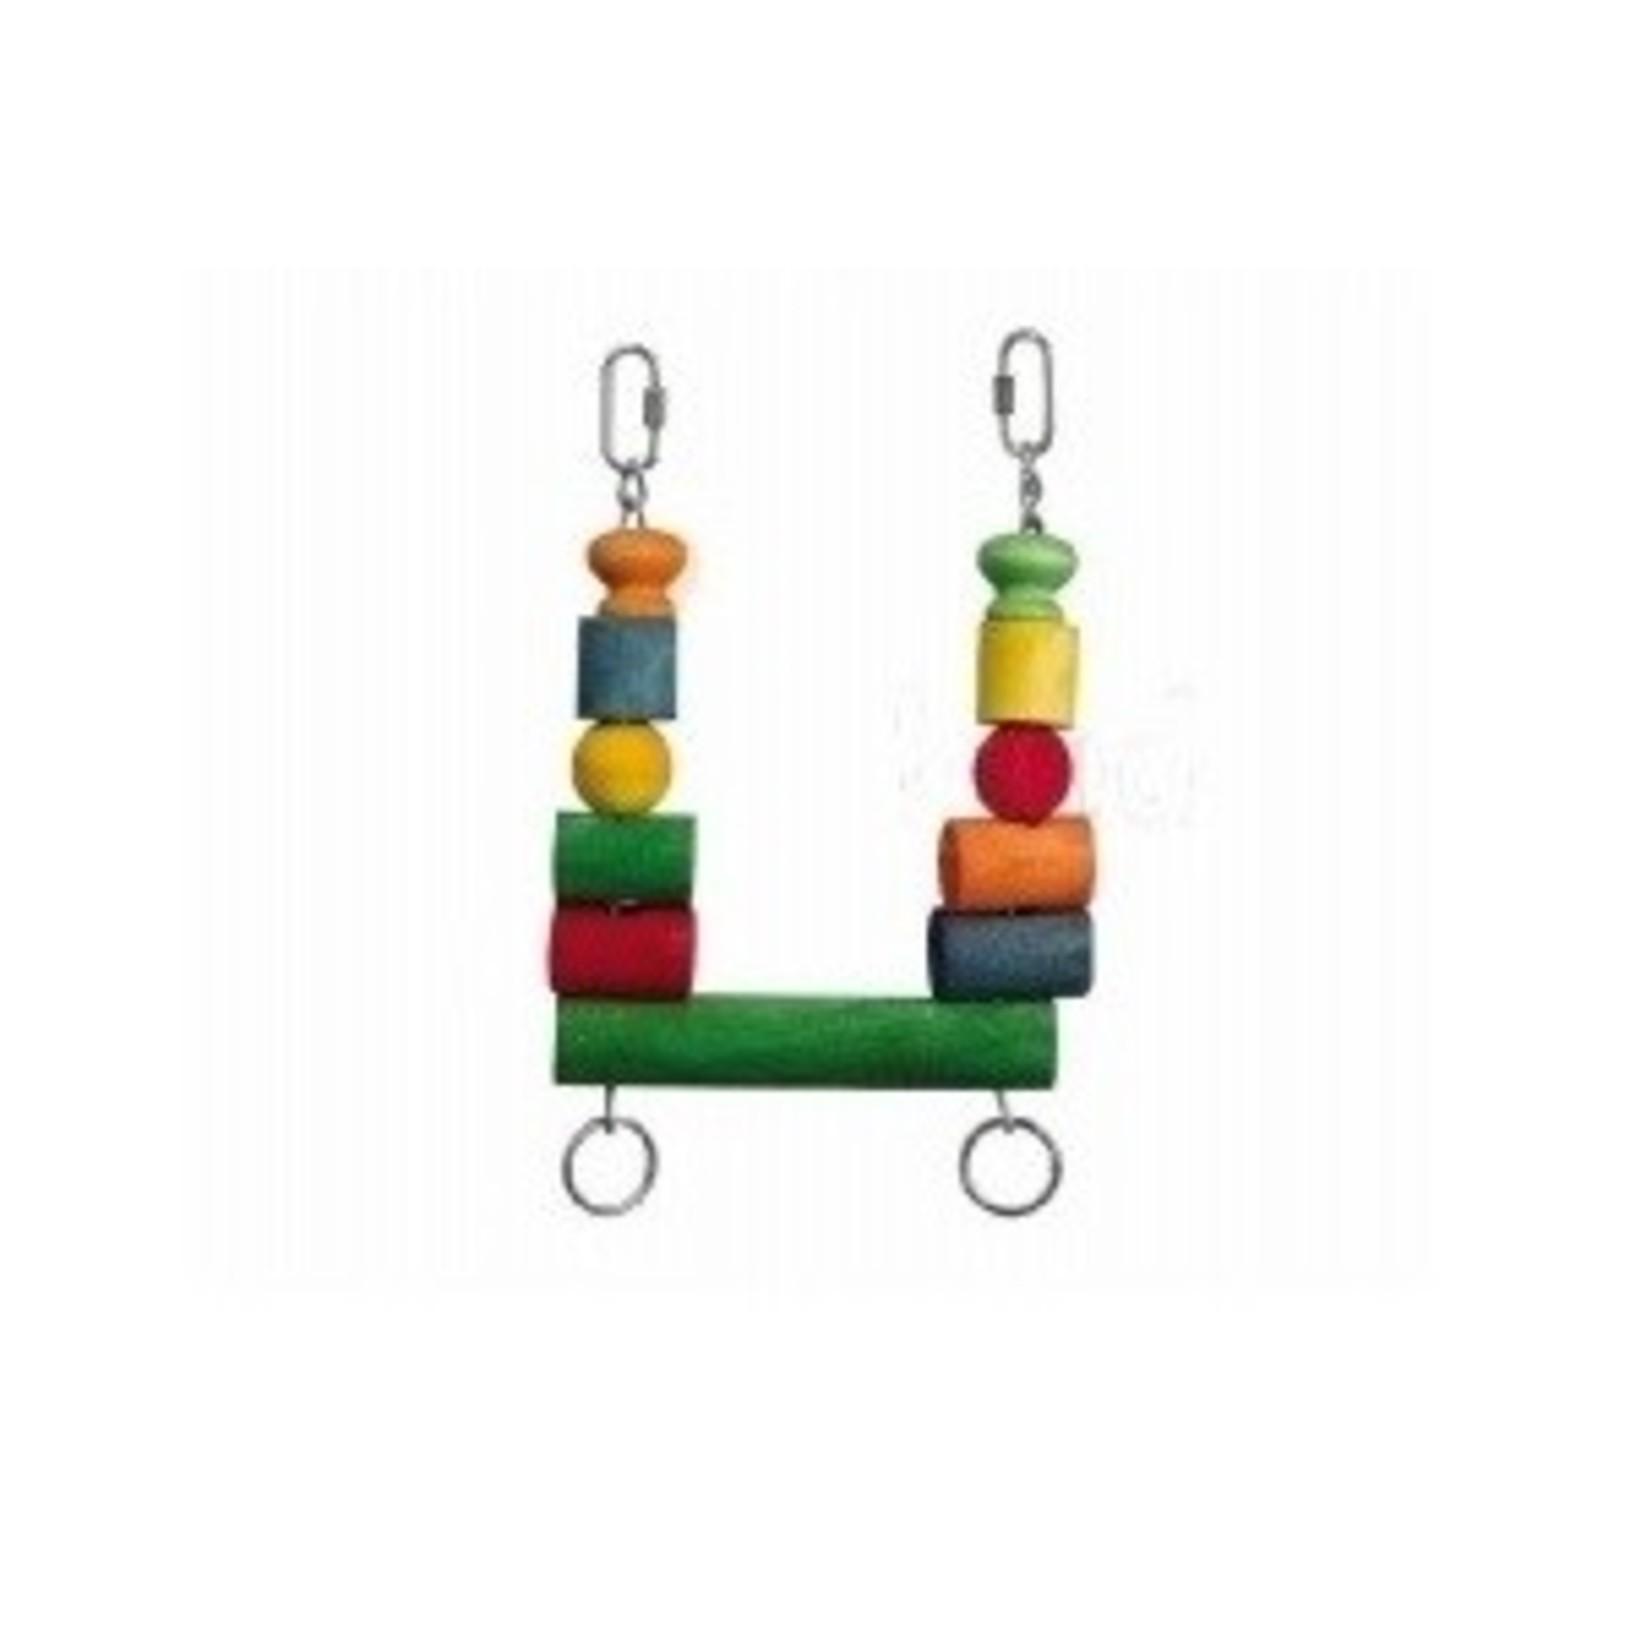 Vogelspeelgoed Swing